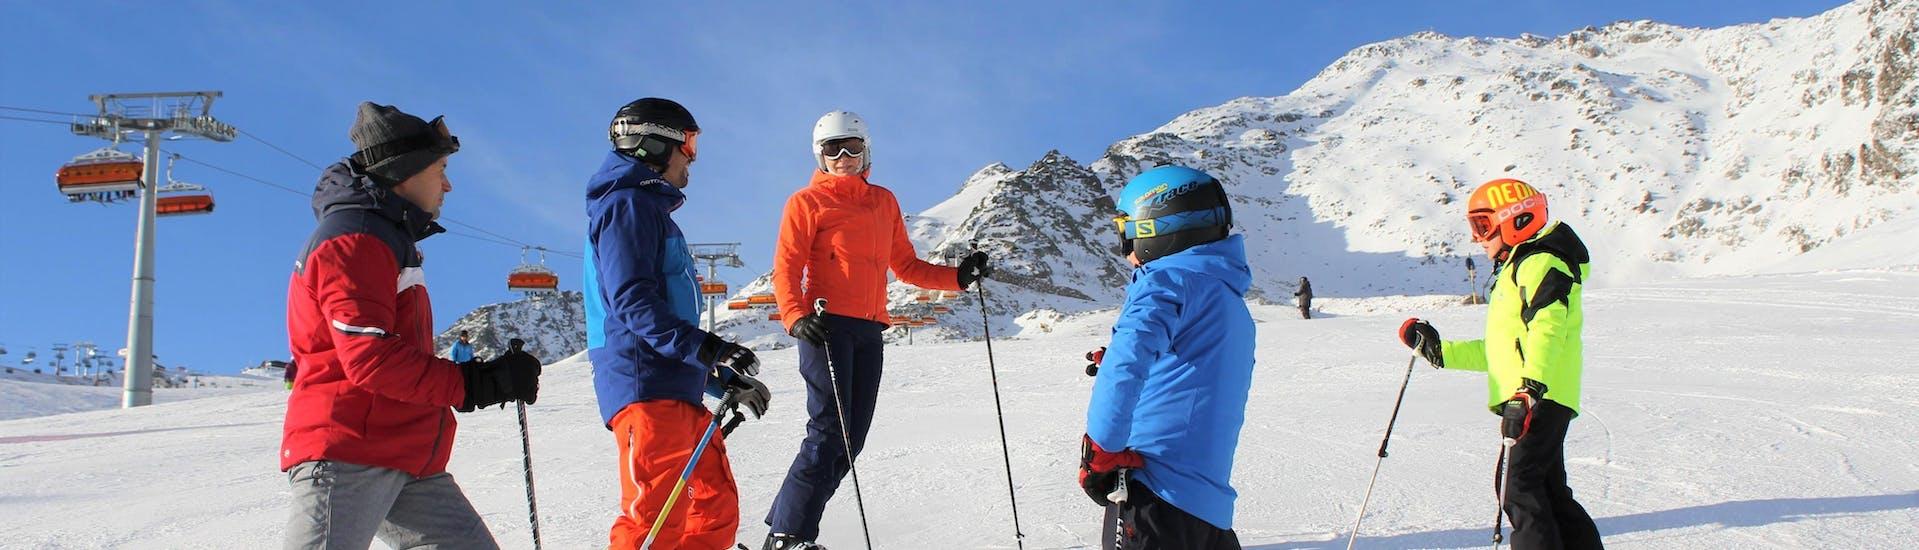 "A ski instructor is explaining the best ski techniques during a Private Ski Lessons ""Family and Friends"" Obergurgl-Hochgurgl organized by the ski school Ski- und Snowboardschule SNOWLINES Sölden in the ski resort of Sölden."